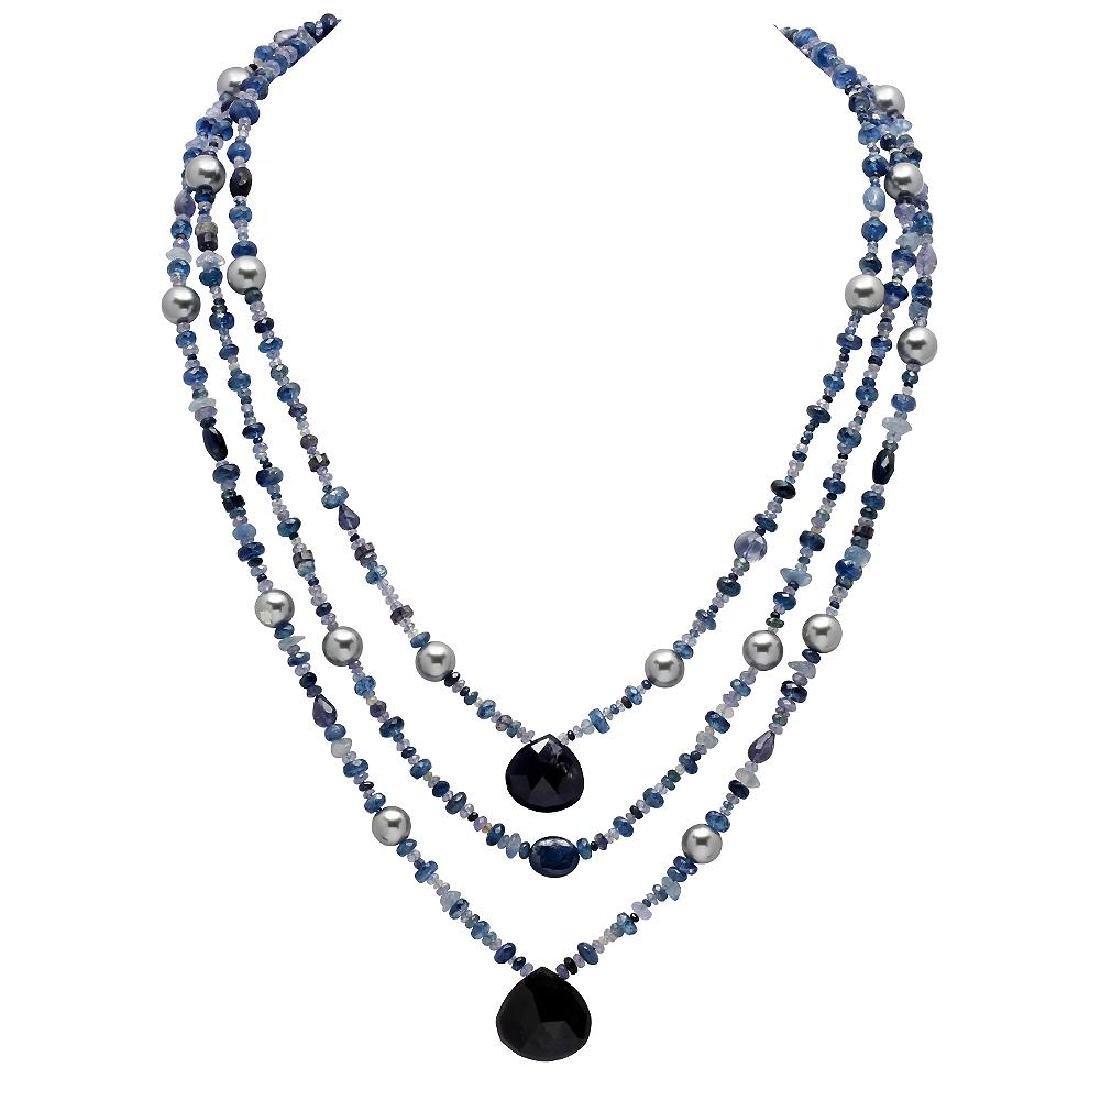 285.00ct Multi-Stone Three Strands Necklace